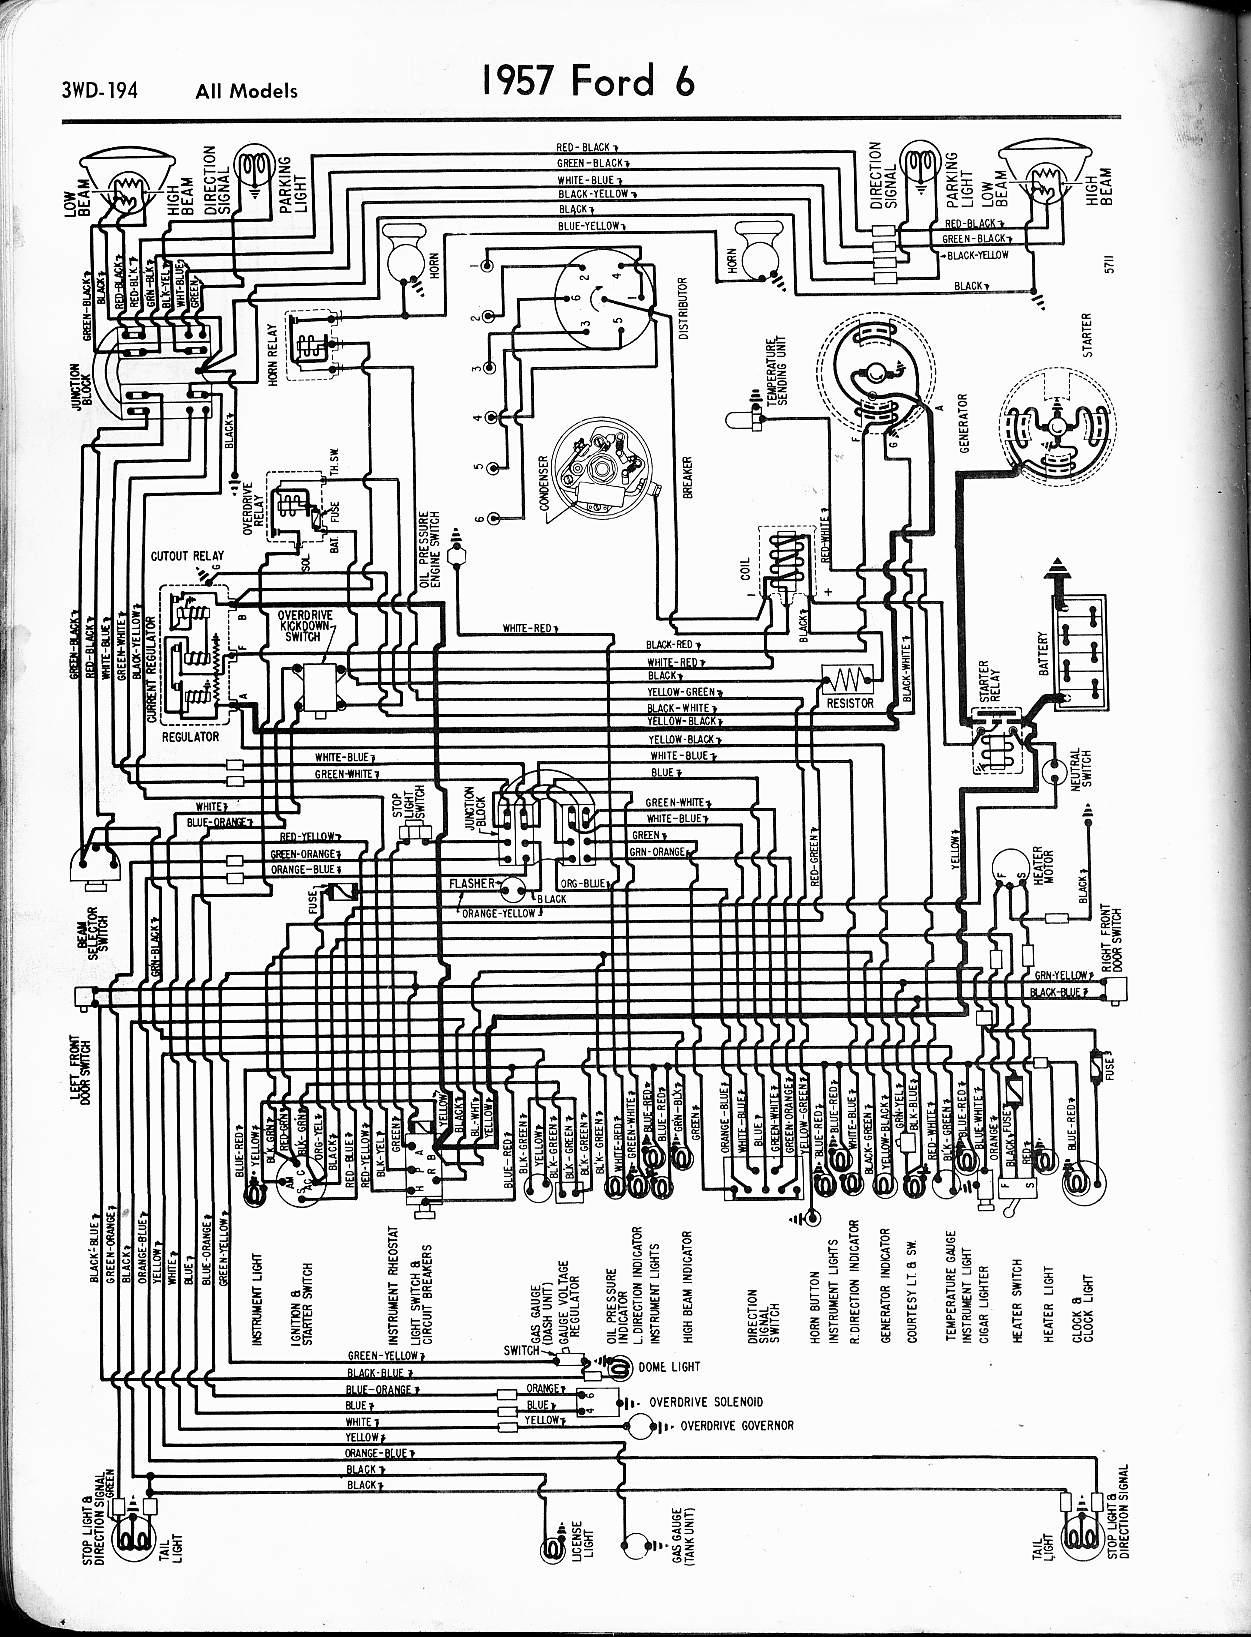 Ford Wiring | Wiring Diagram - Model A Ford Wiring Diagram